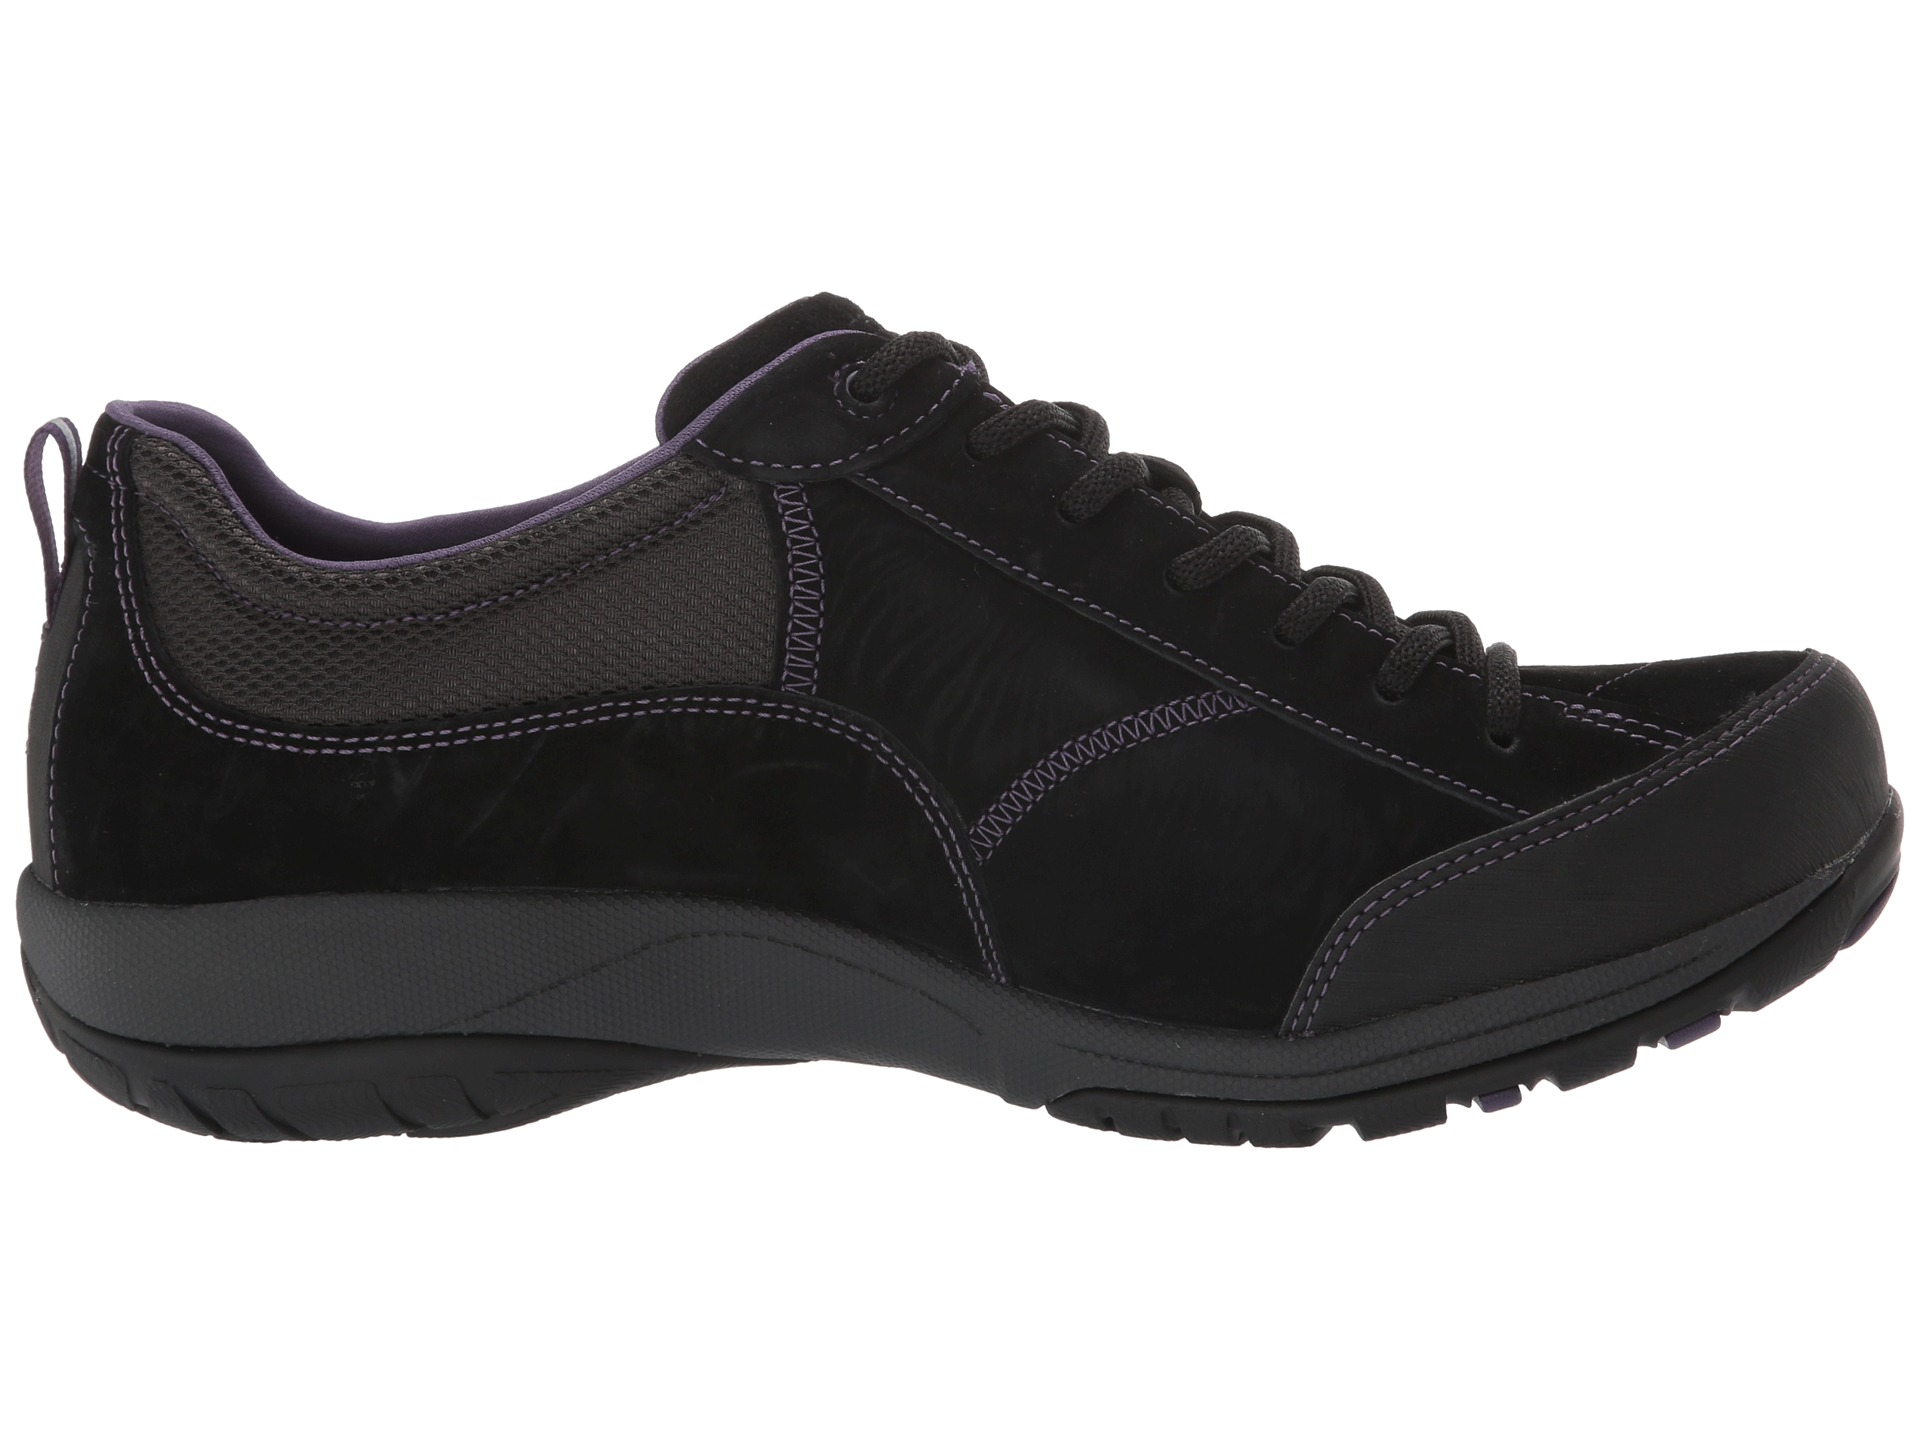 dansko management Dansko is a comfort footwear company based in west grove, pennsylvania dansko was founded in 1990 by husband and wife team, peter kjellerup and mandy.